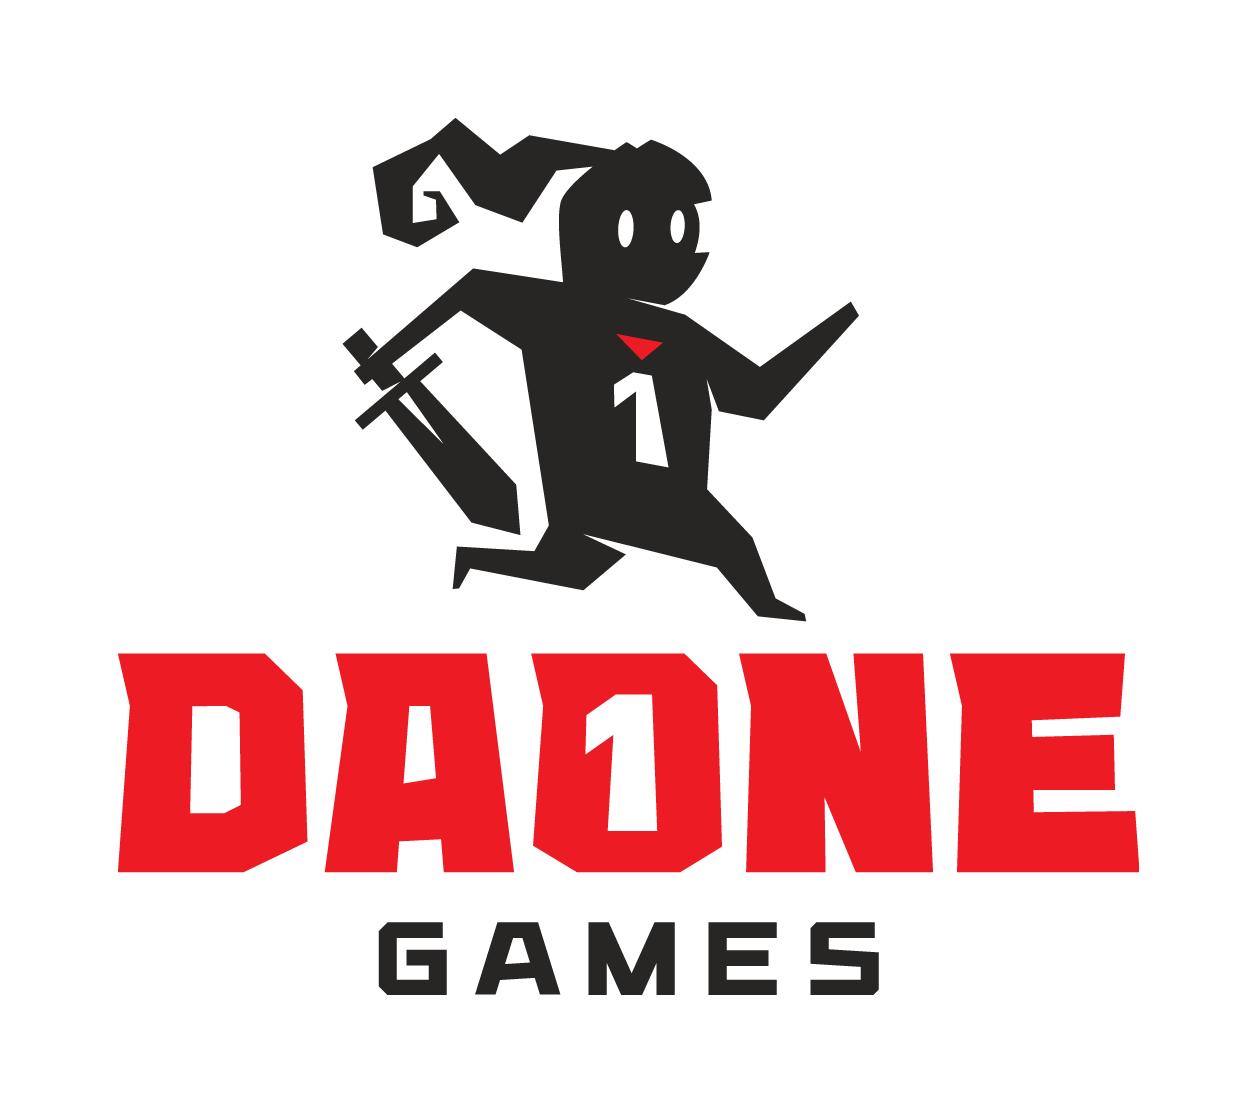 DaOne Games